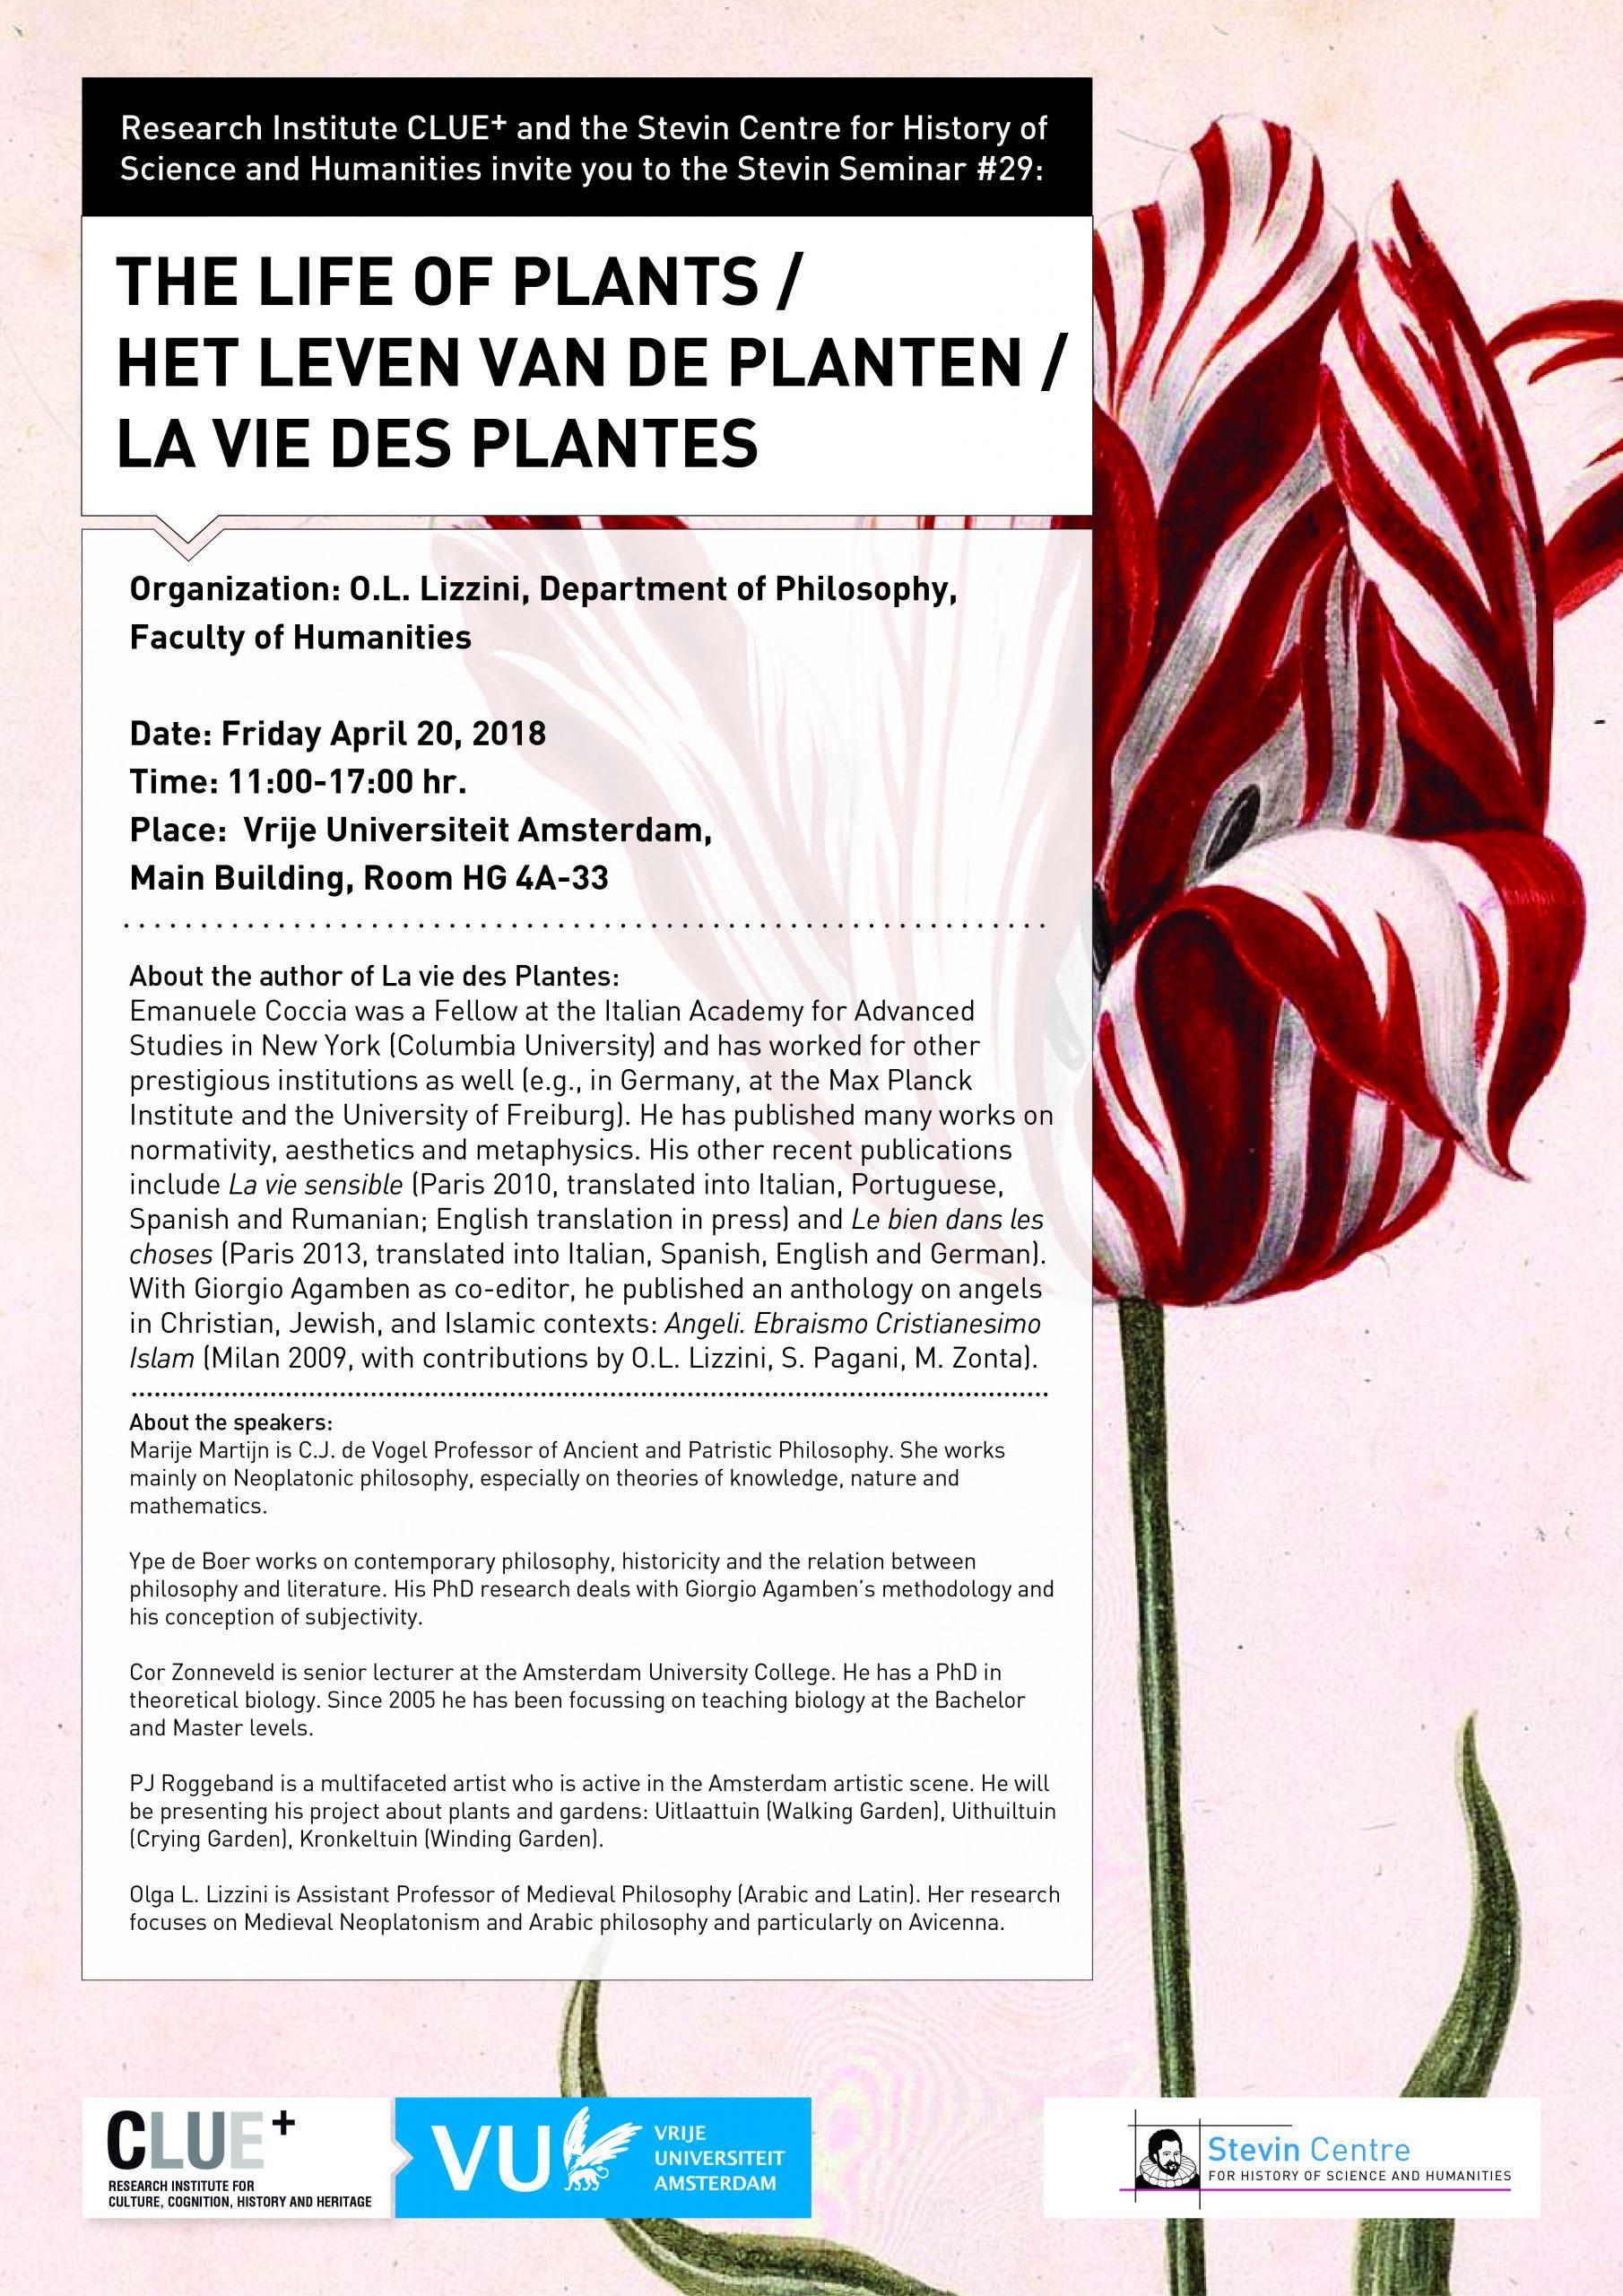 Poster_Stevin_Seminar_29_tcm277-882704